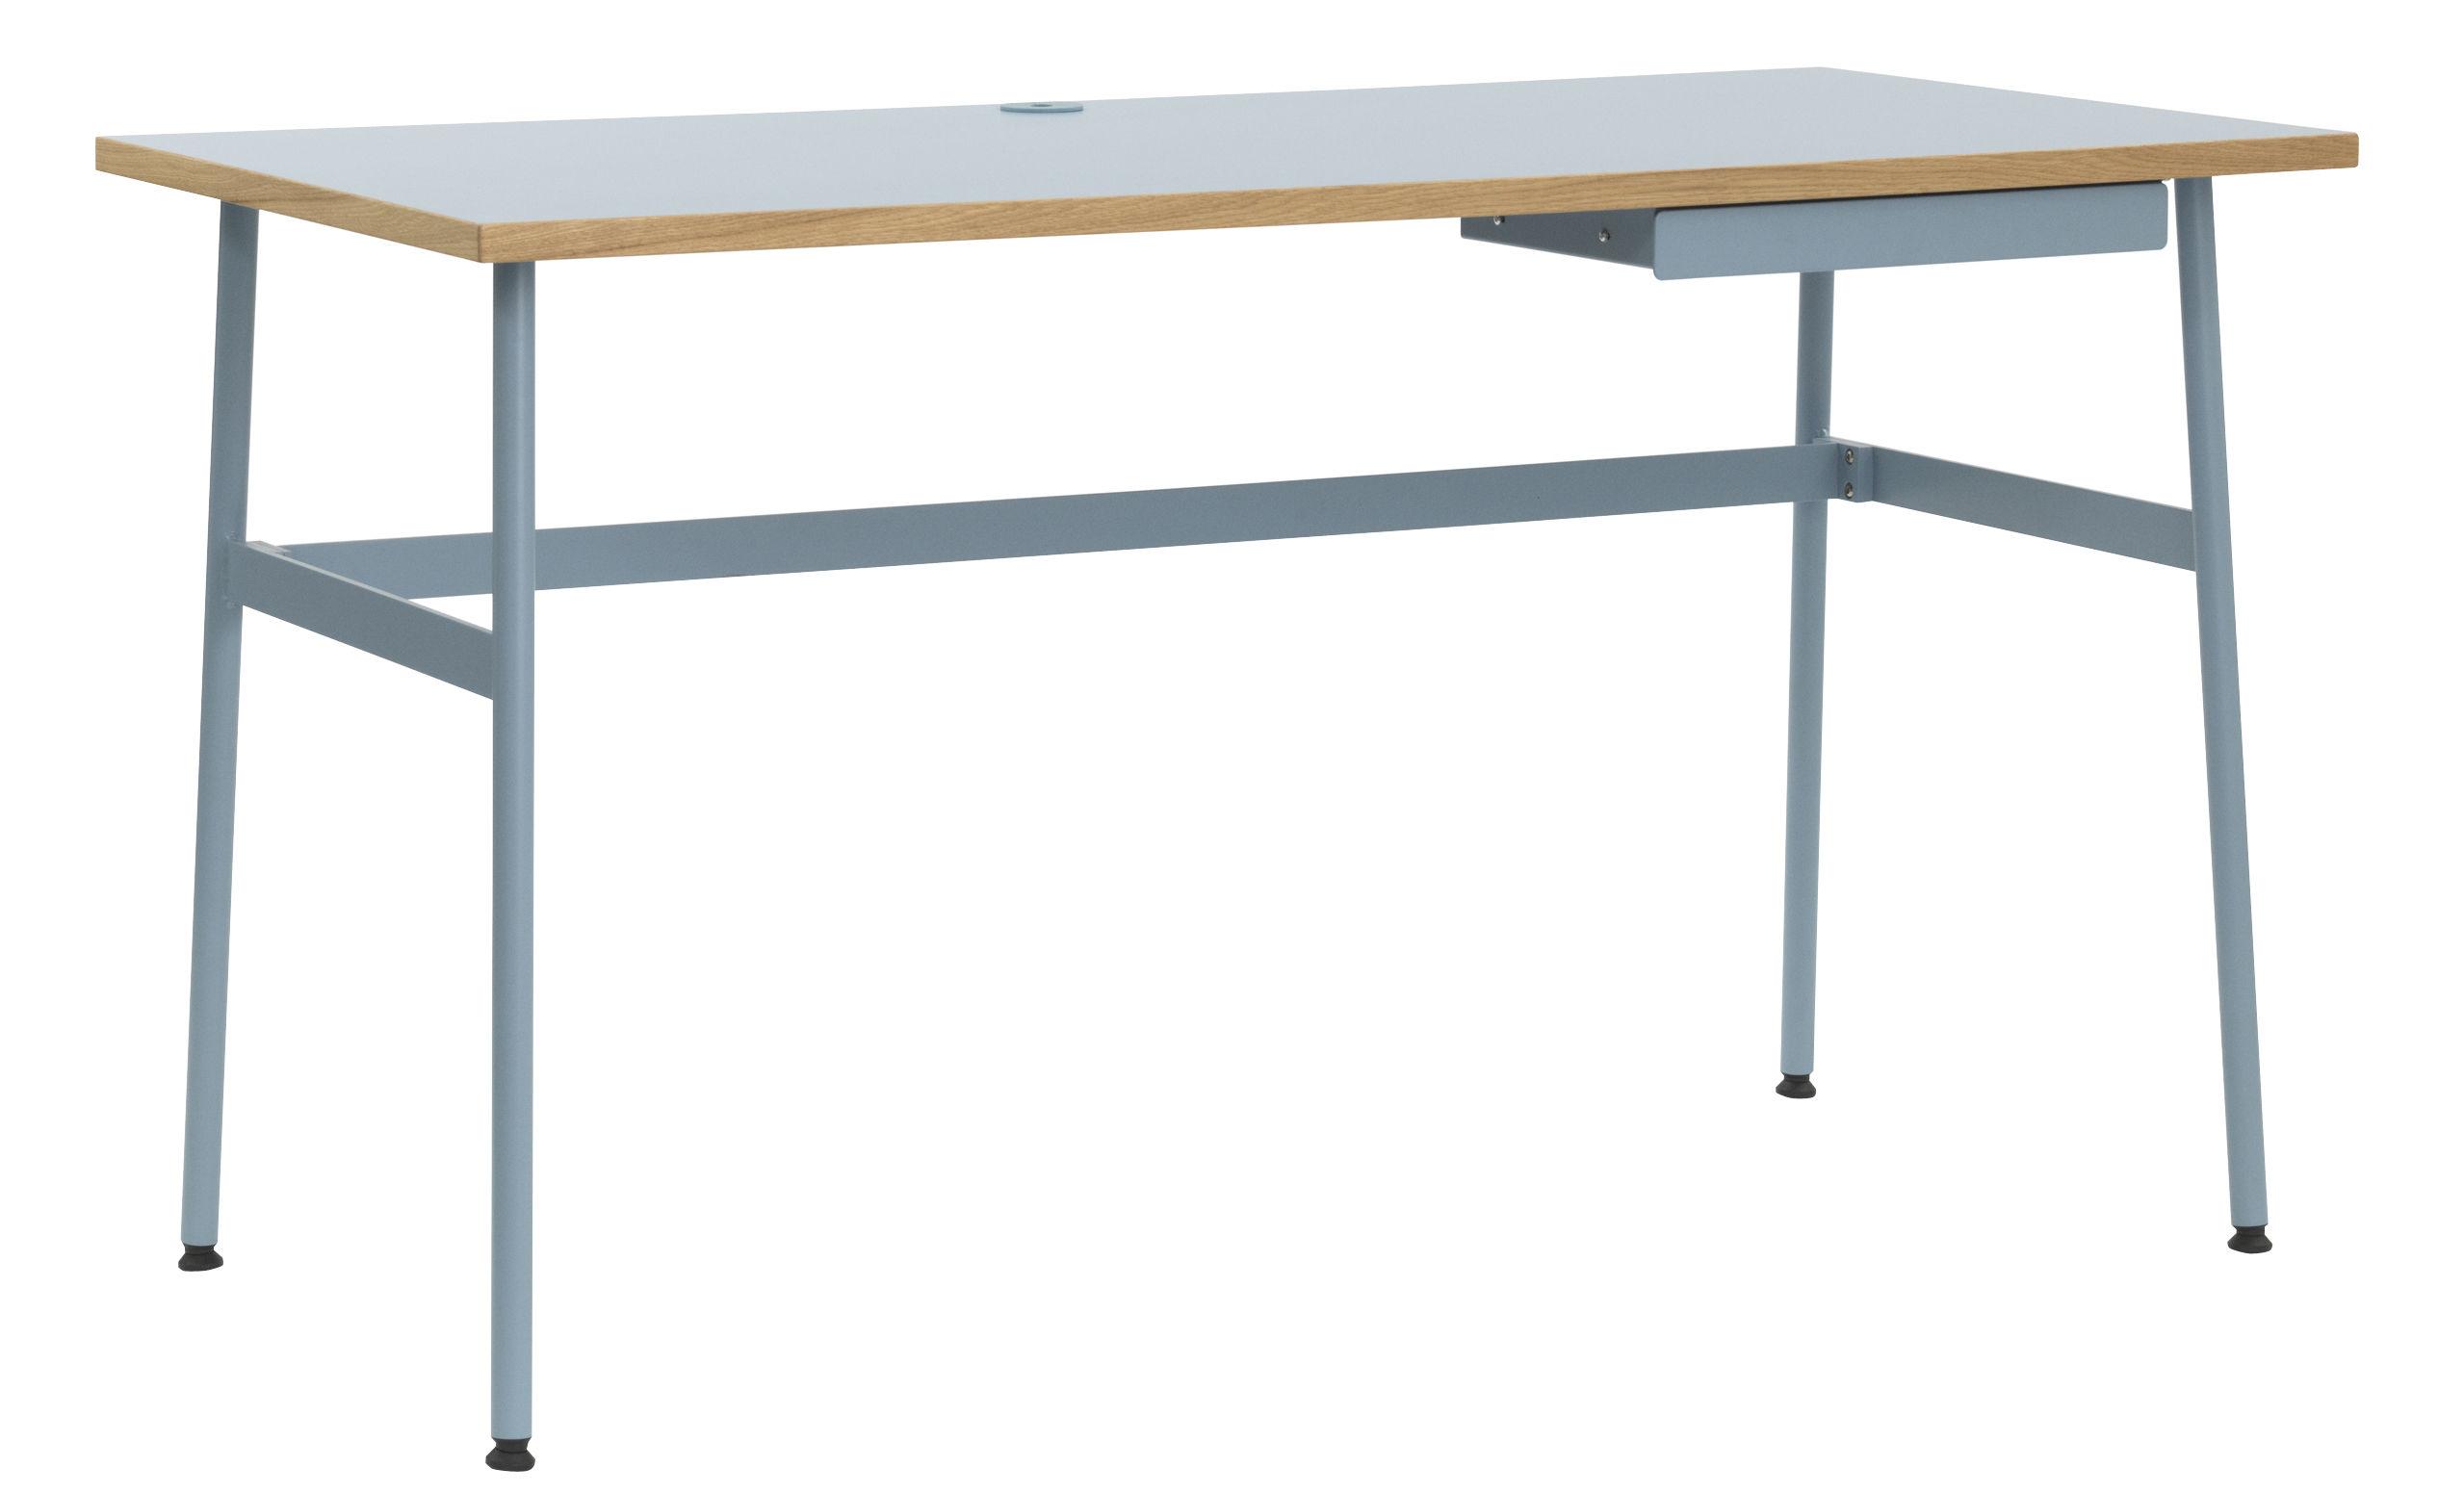 Furniture - Office Furniture - Journal Desk - 1 drawer by Normann Copenhagen - Light blue - Lacquered steel, Melamine laminate